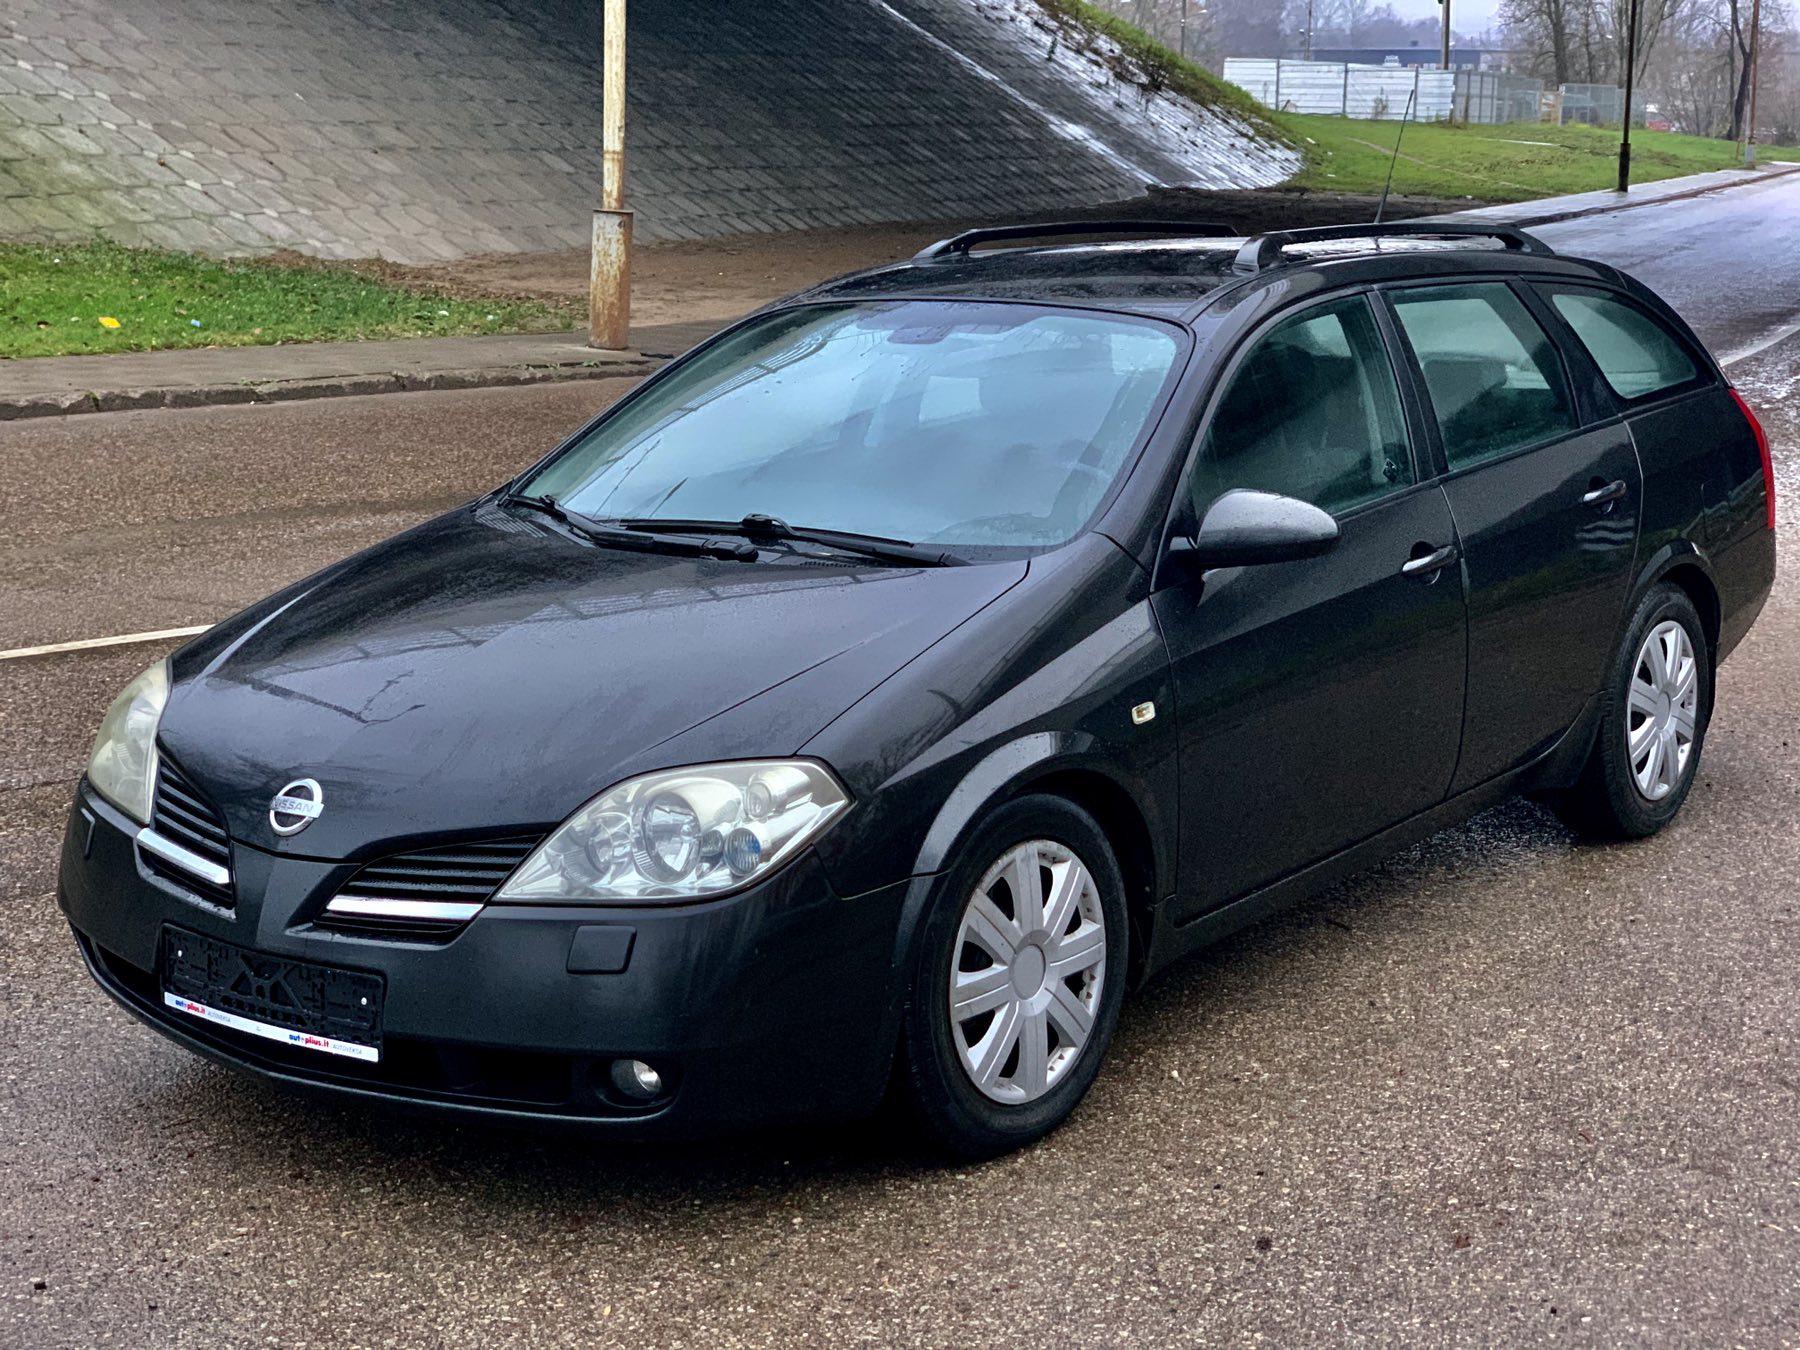 Nissan Primera, 2.2 l., universalas